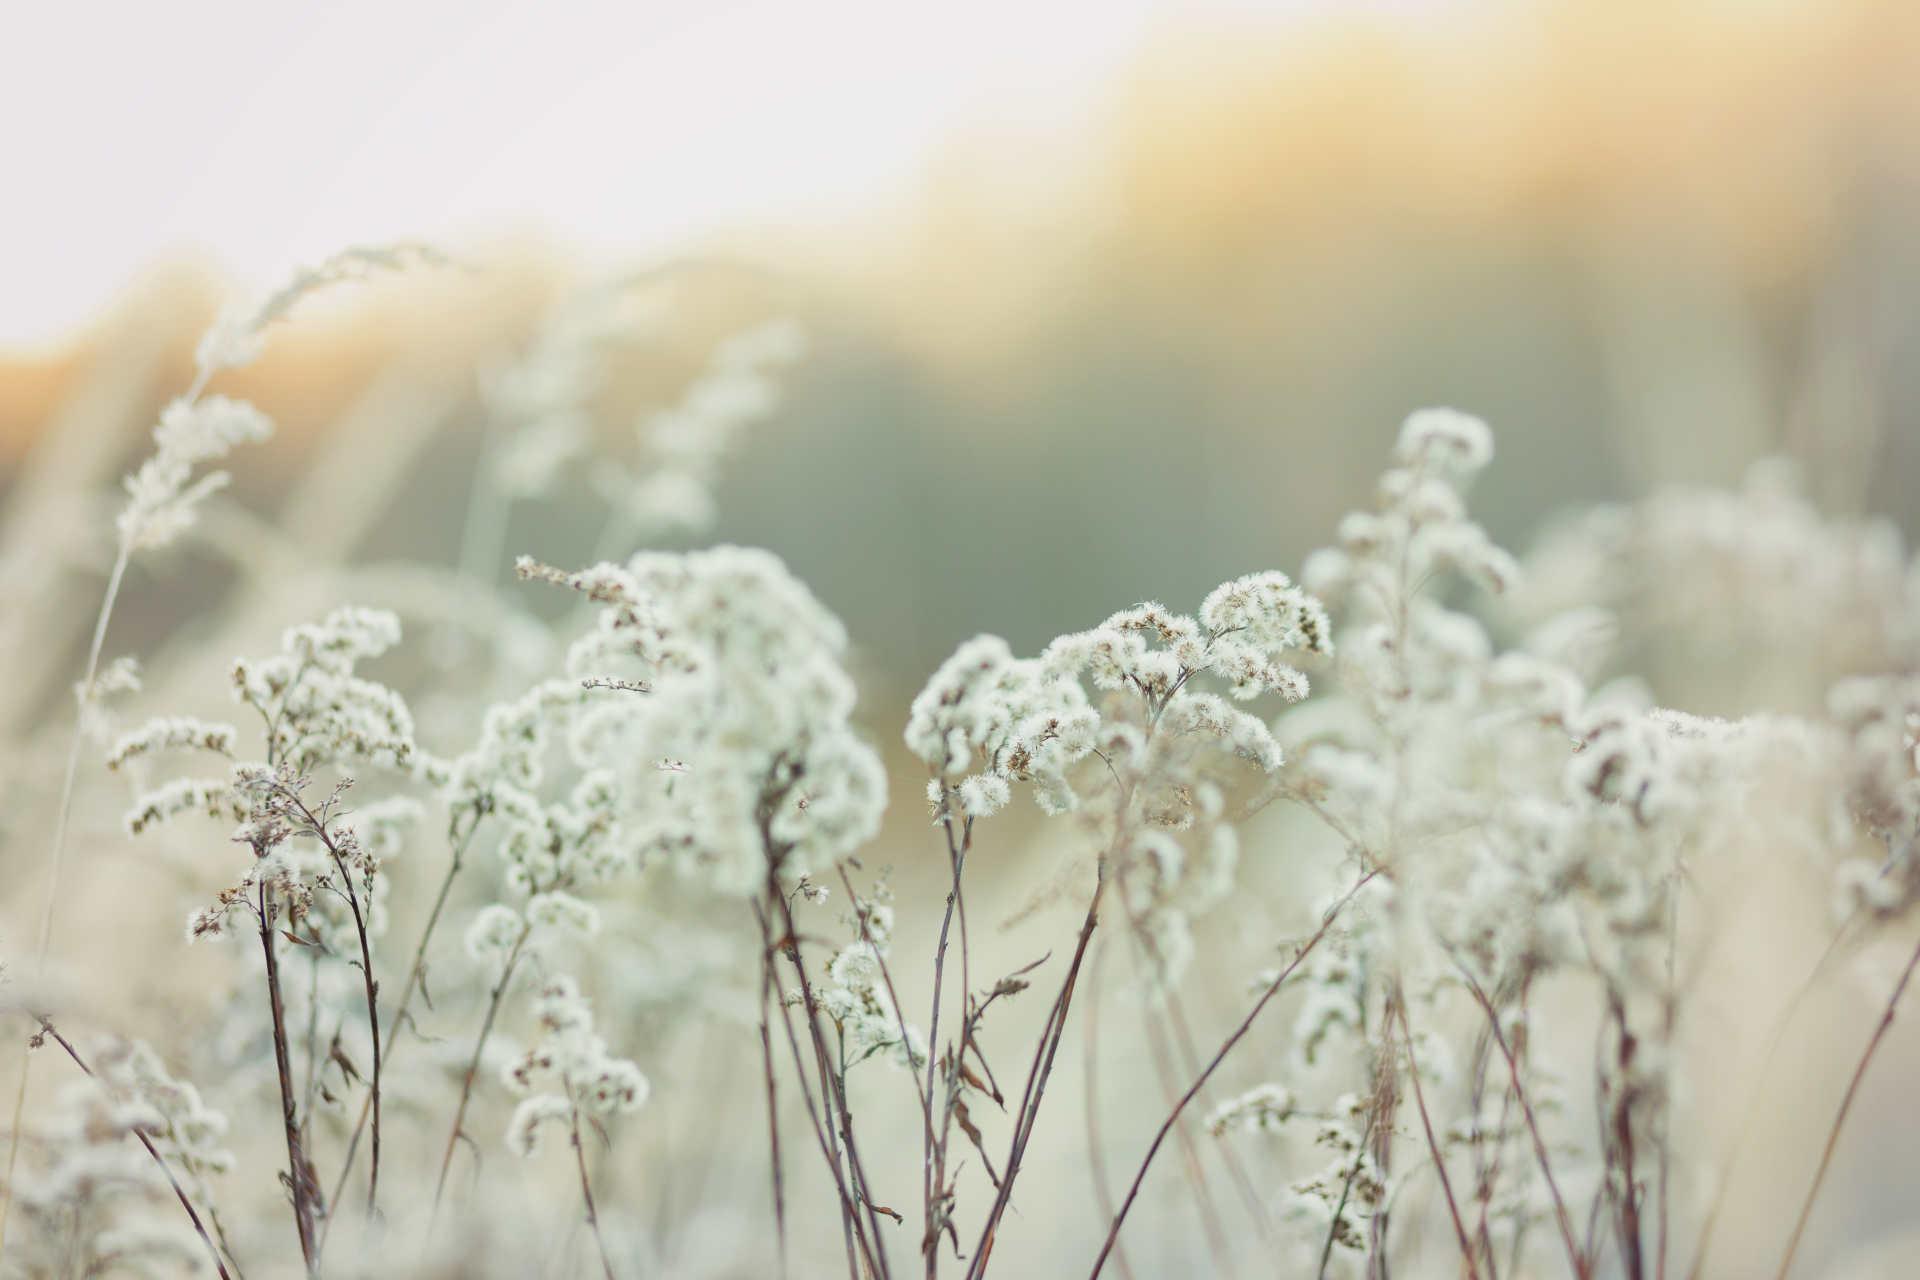 Vista de flores silvestres